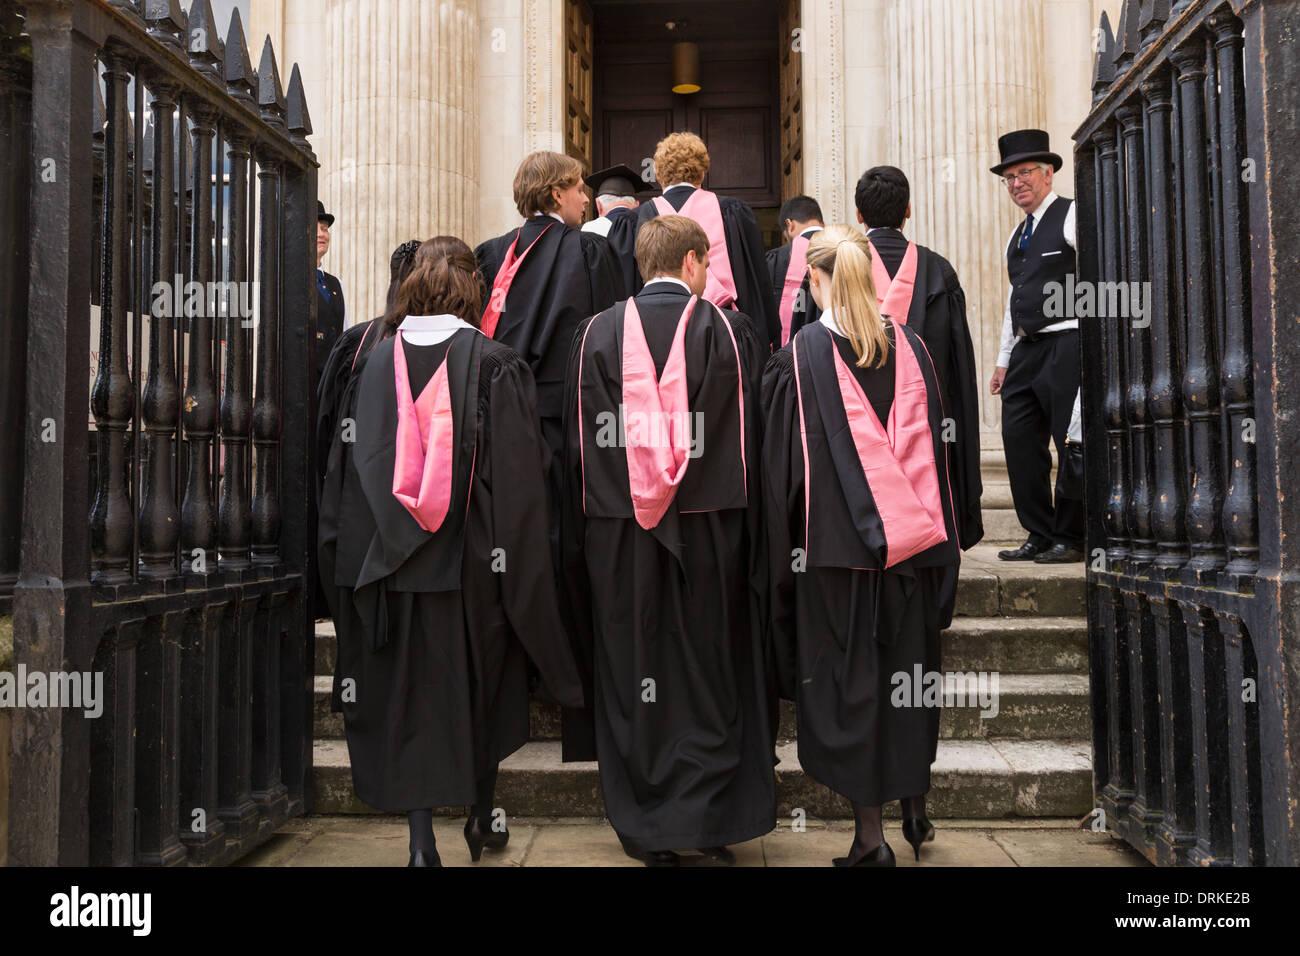 Cambridge University graduates Senate House to receive degree, England - Stock Image